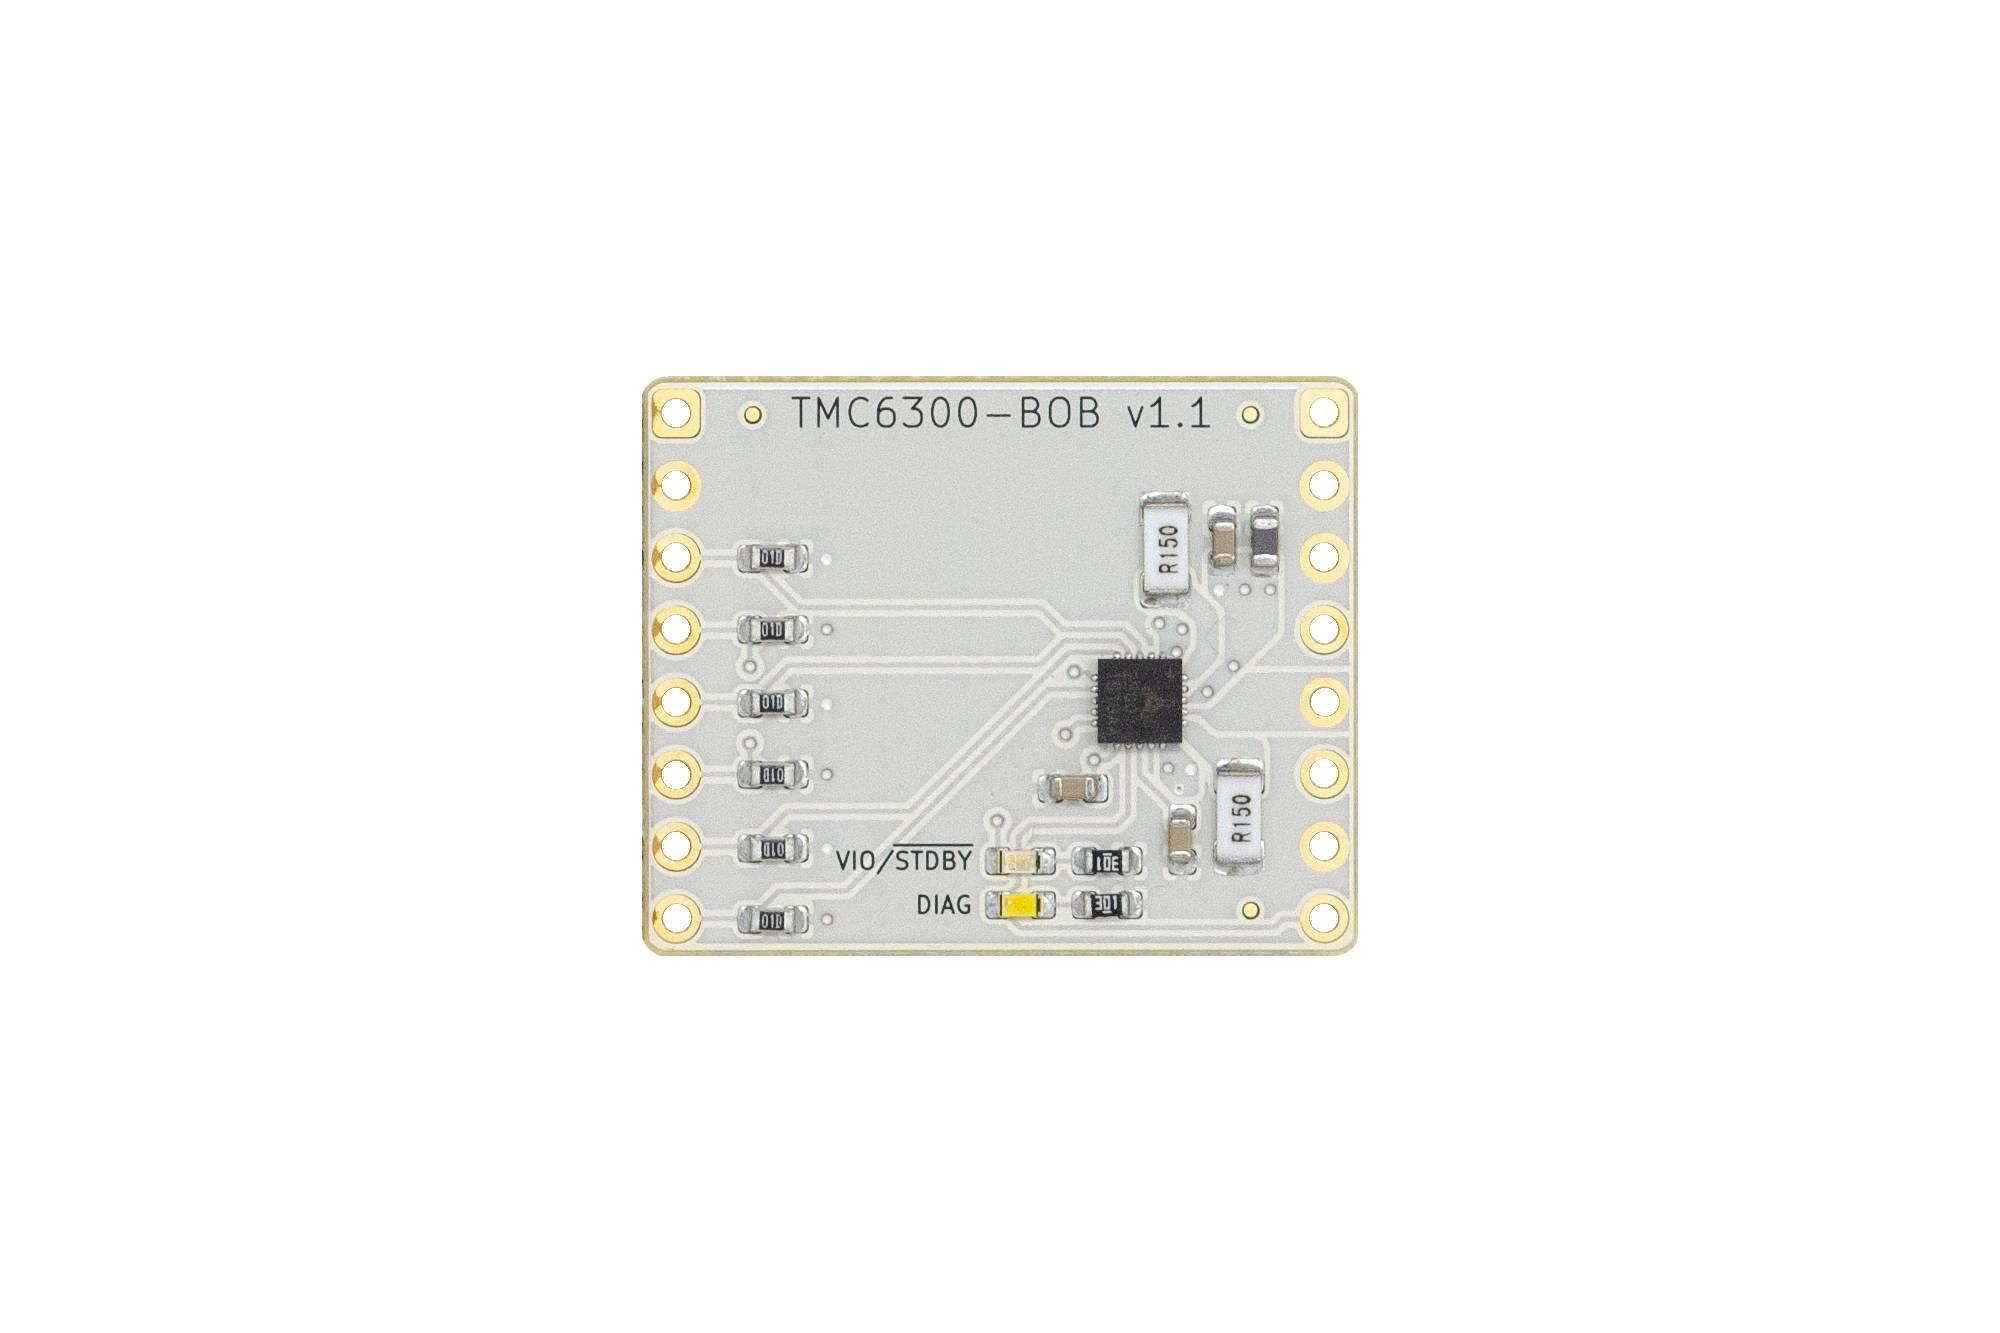 TMC6300-BOB